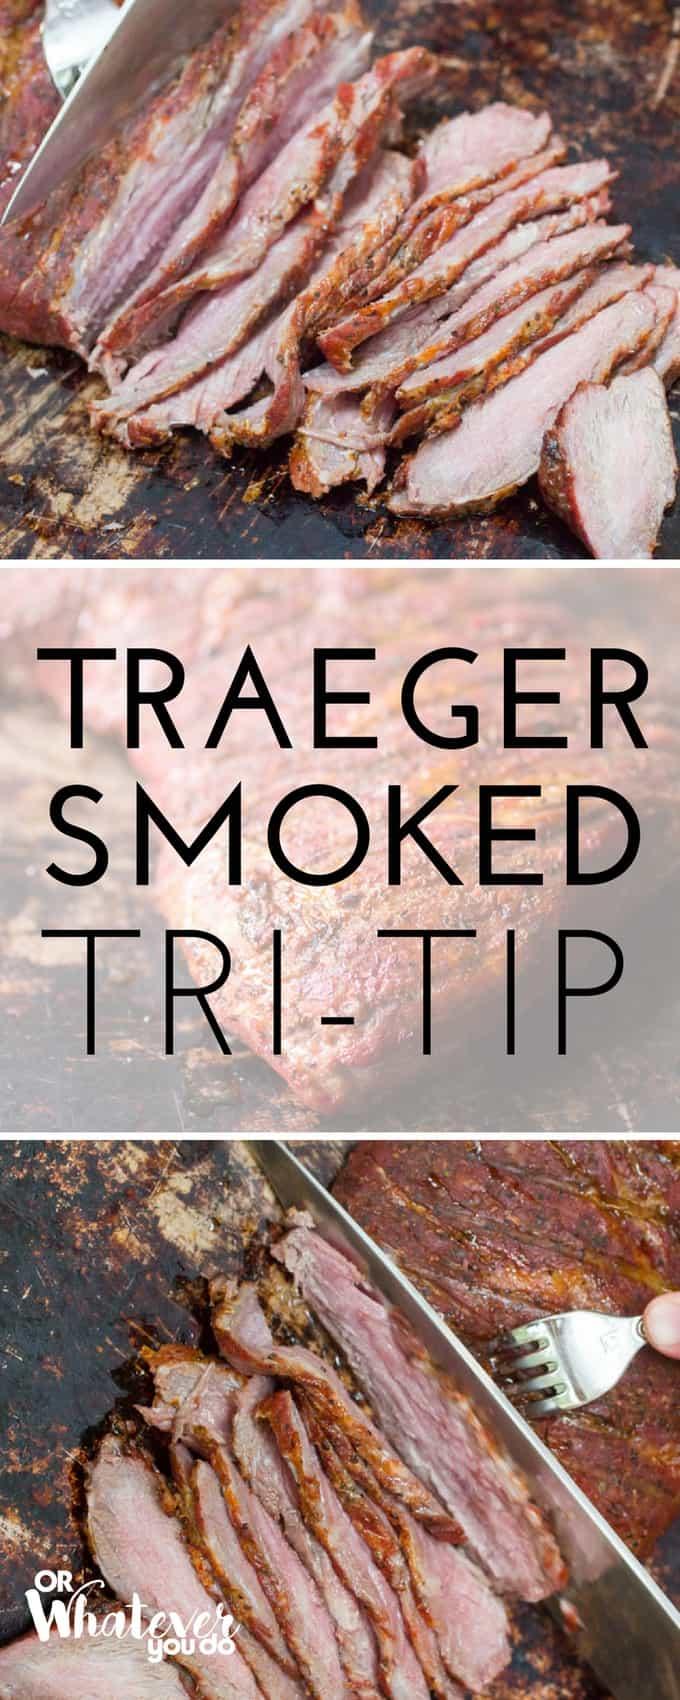 Traeger Smoked Tri-Tip